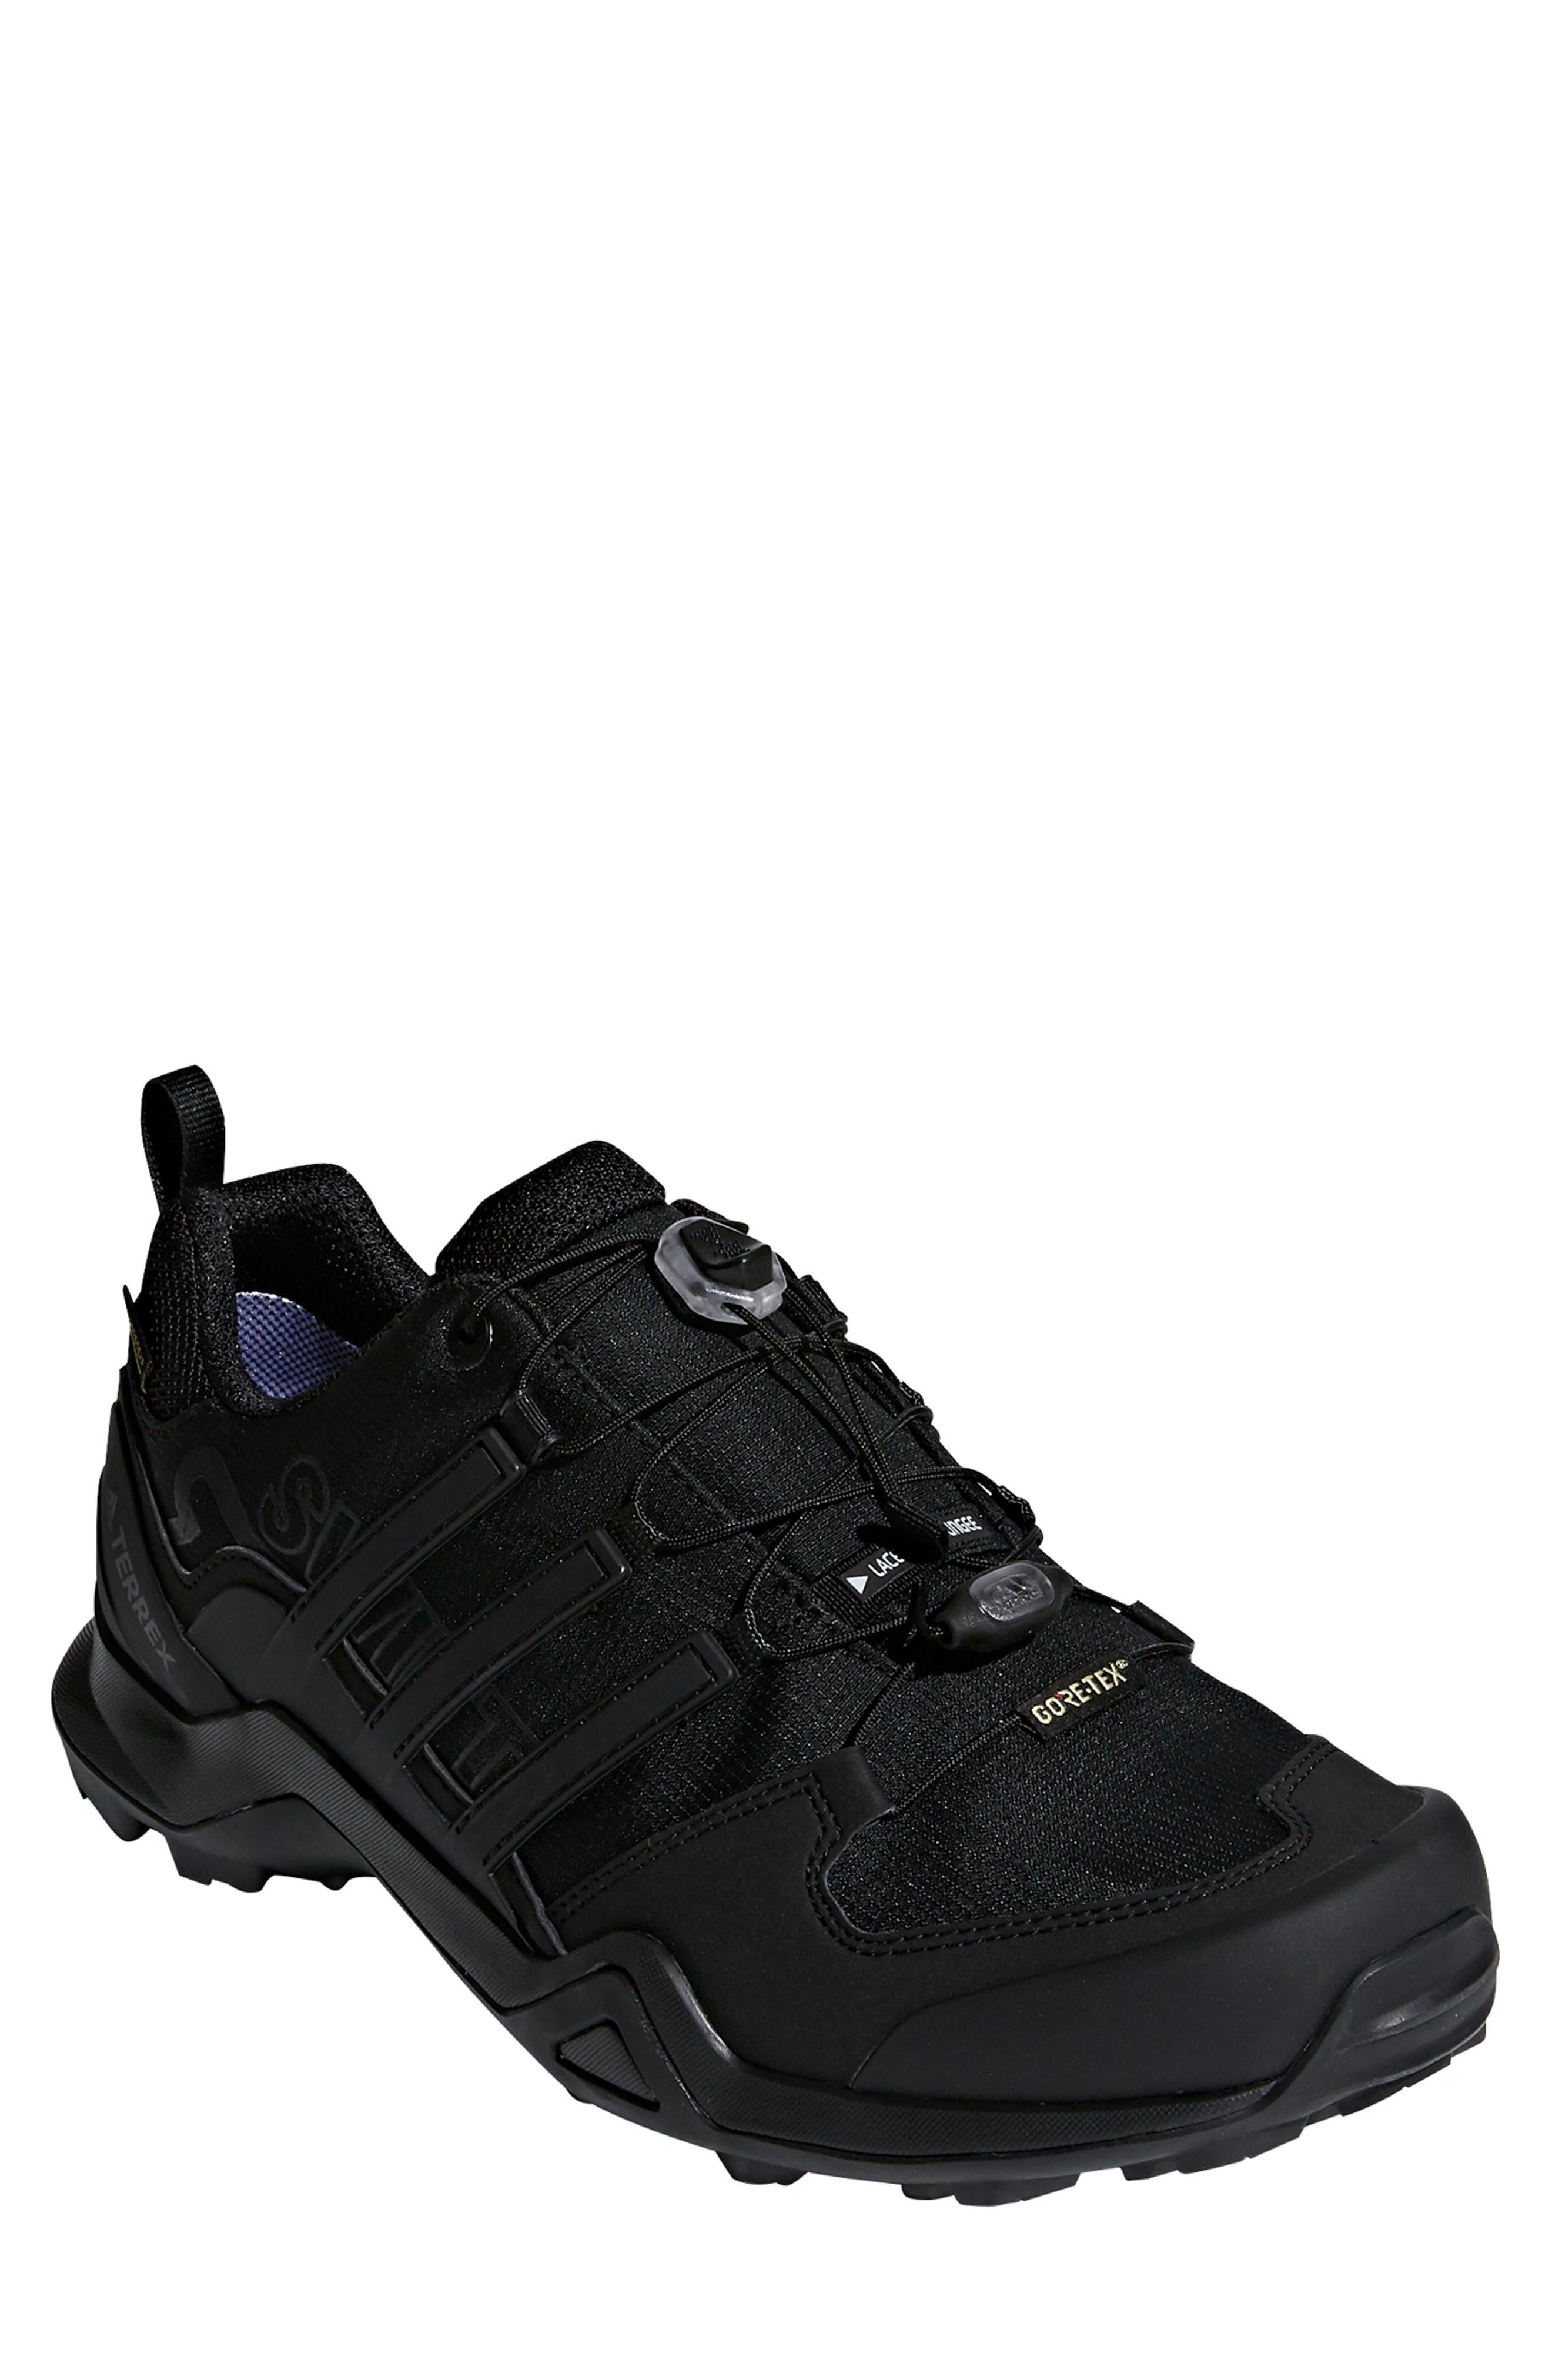 ADIDAS Terrex Swift R2 GTX Gore-Tex<sup>®</sup> Waterproof Hiking Shoe, Main, color, BLACK/ BLACK/ BLACK